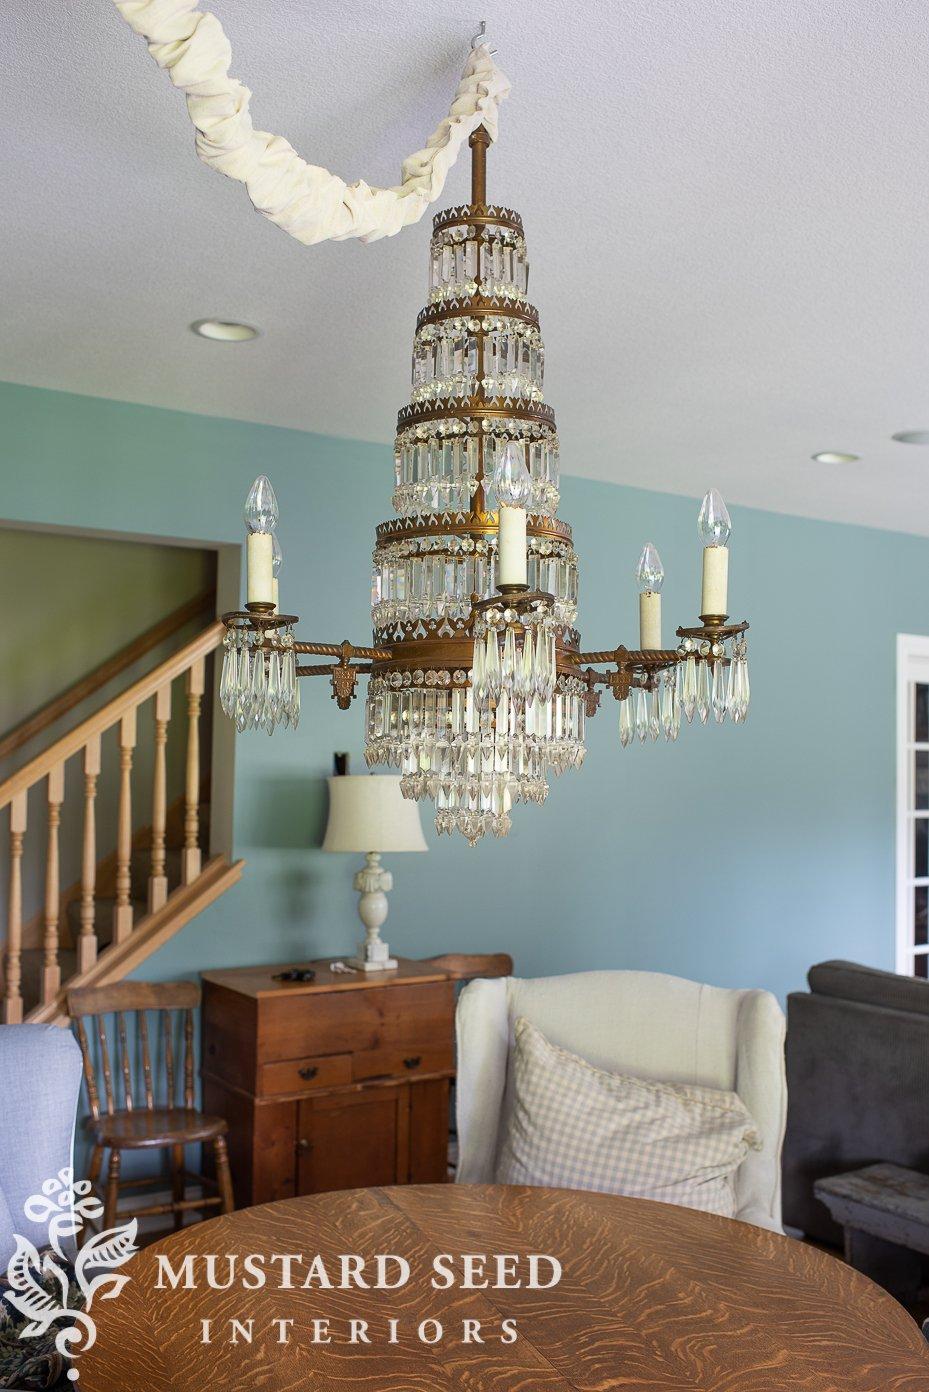 1800s crystal chandelier   july 2021 favorites   miss mustard seed